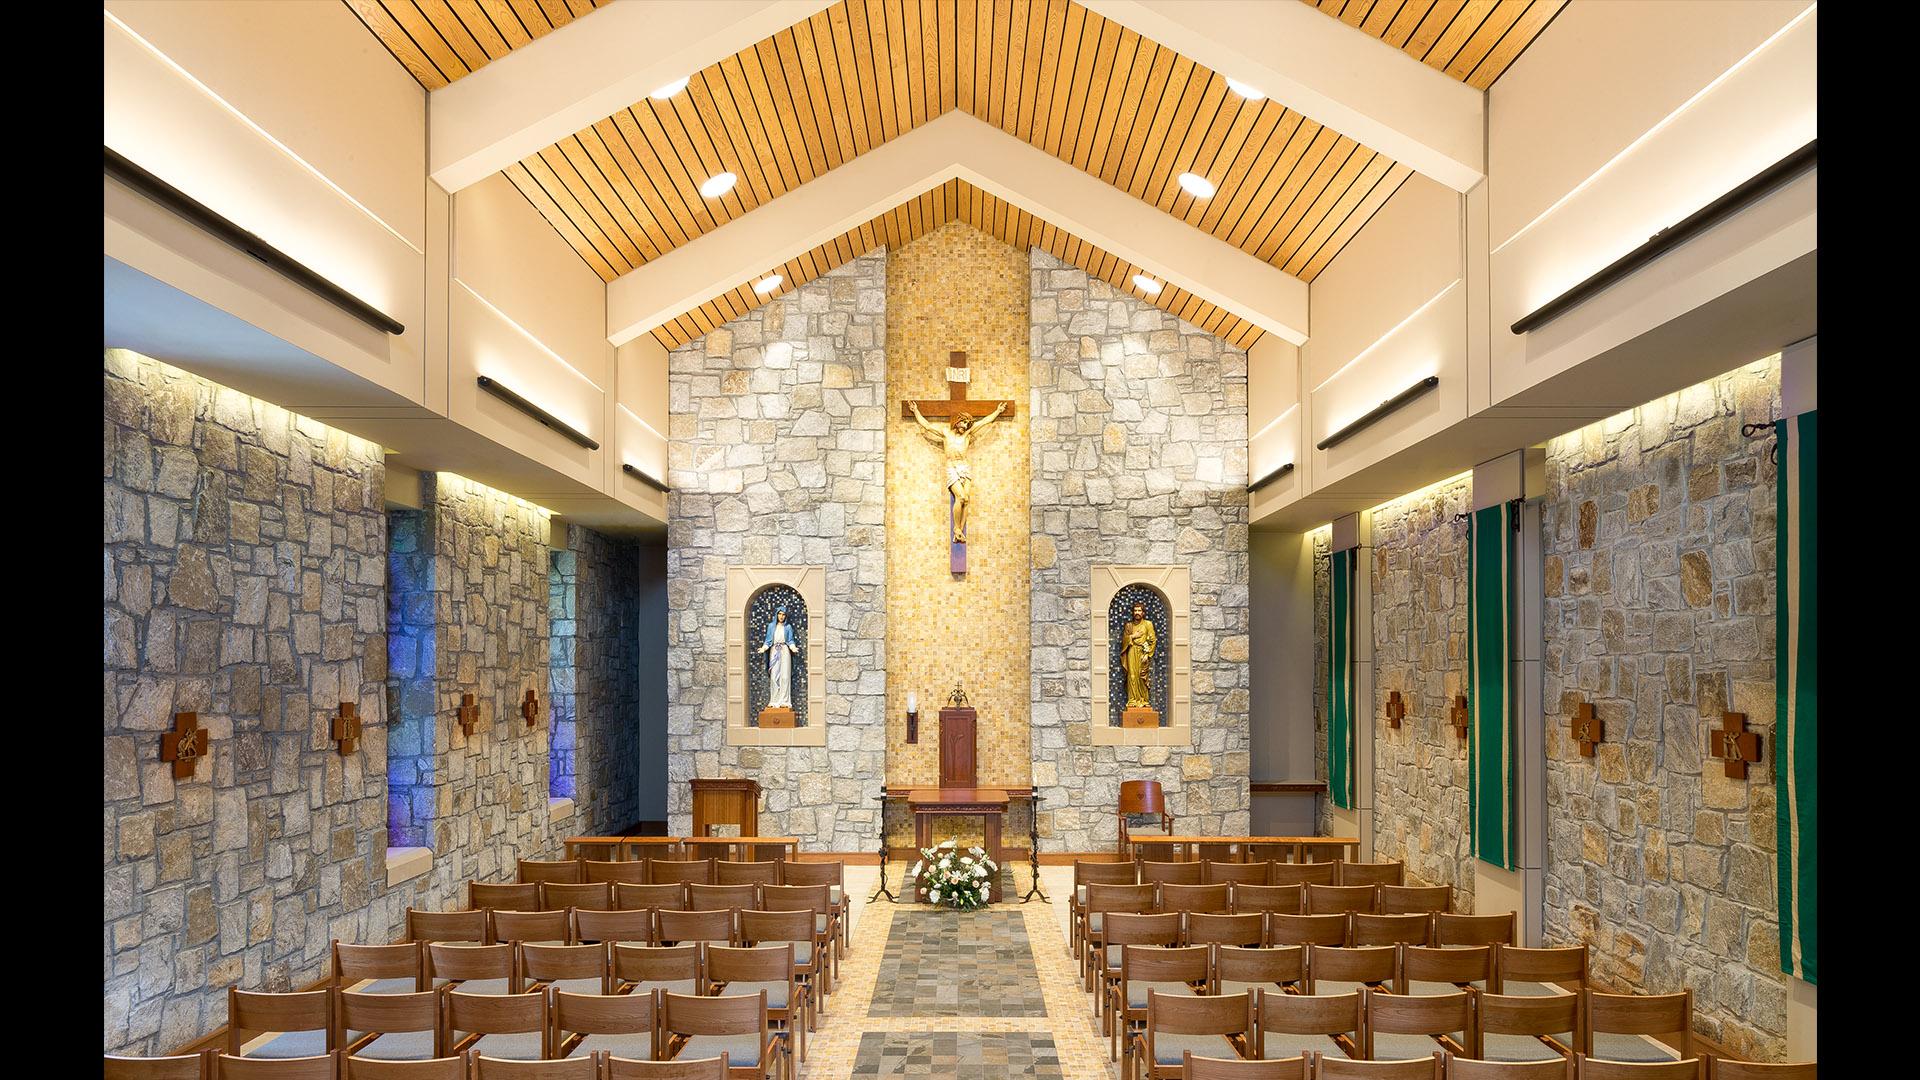 2913-0010-St John Neumann Chapel by Kevin Ames